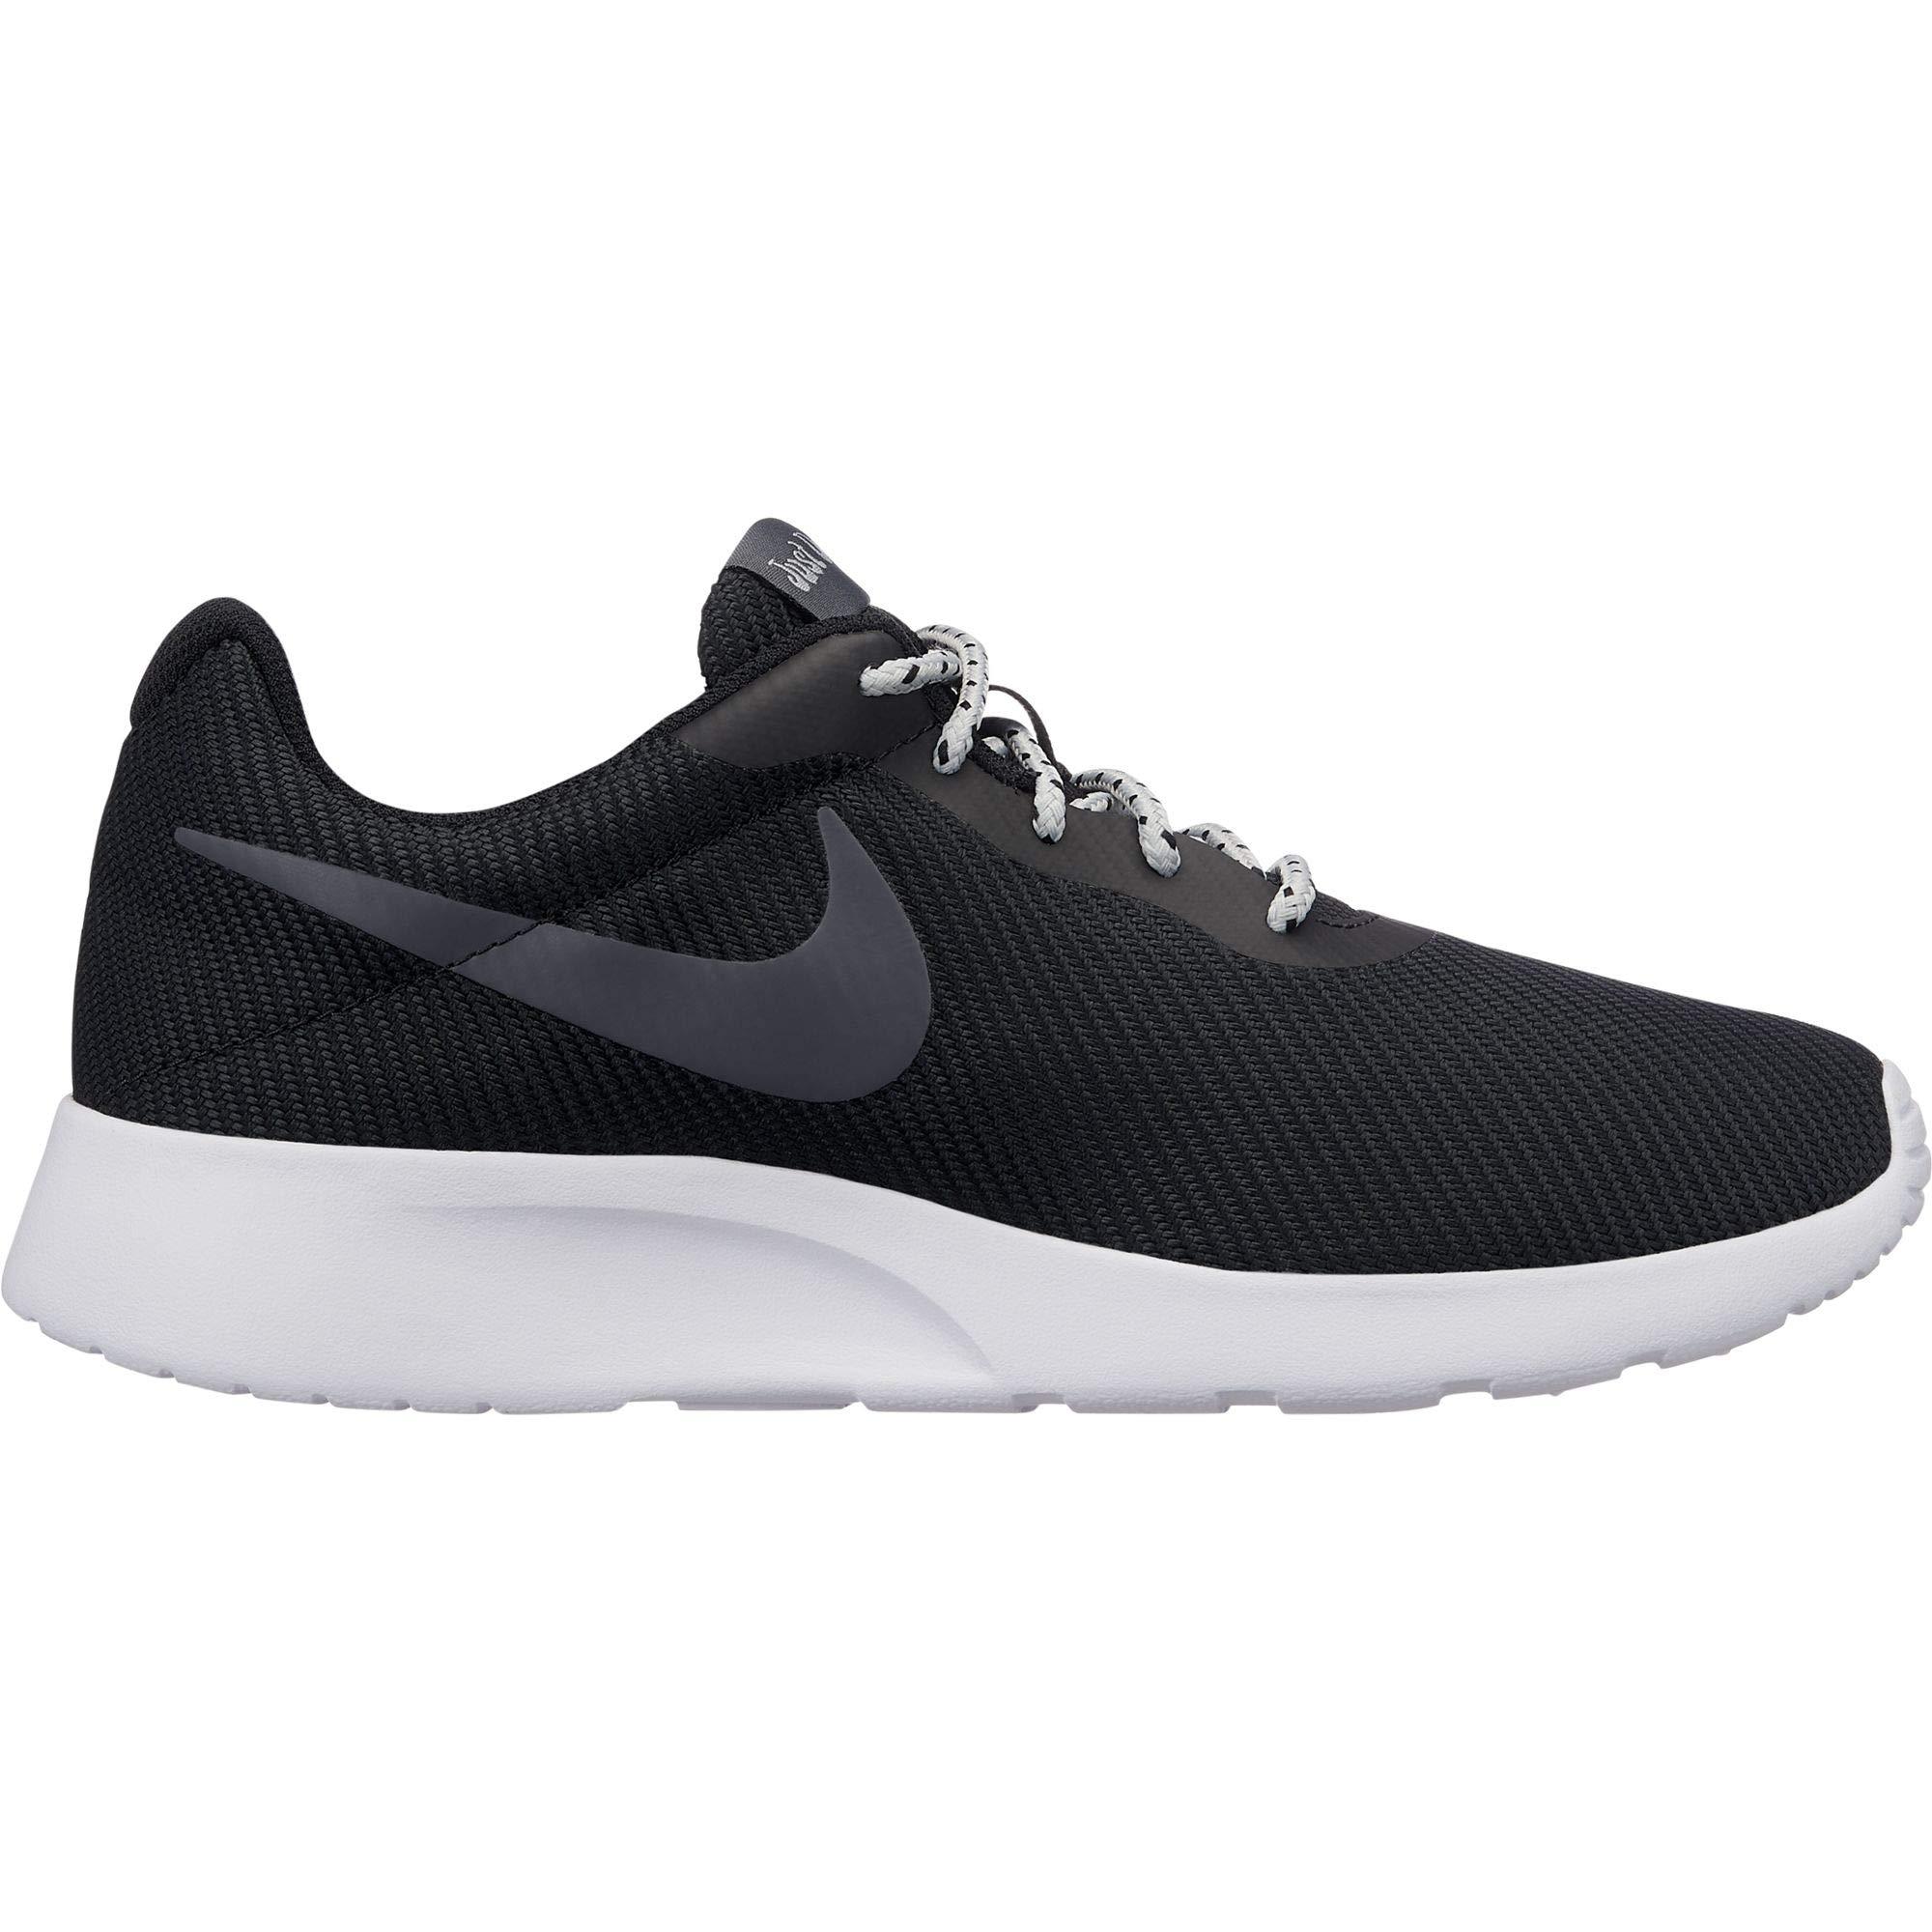 new style 09f2d 2ee29 Galleon - Nike Women s Tanjun SE Running Shoes, Black Dark Grey-Wolf Grey,  10